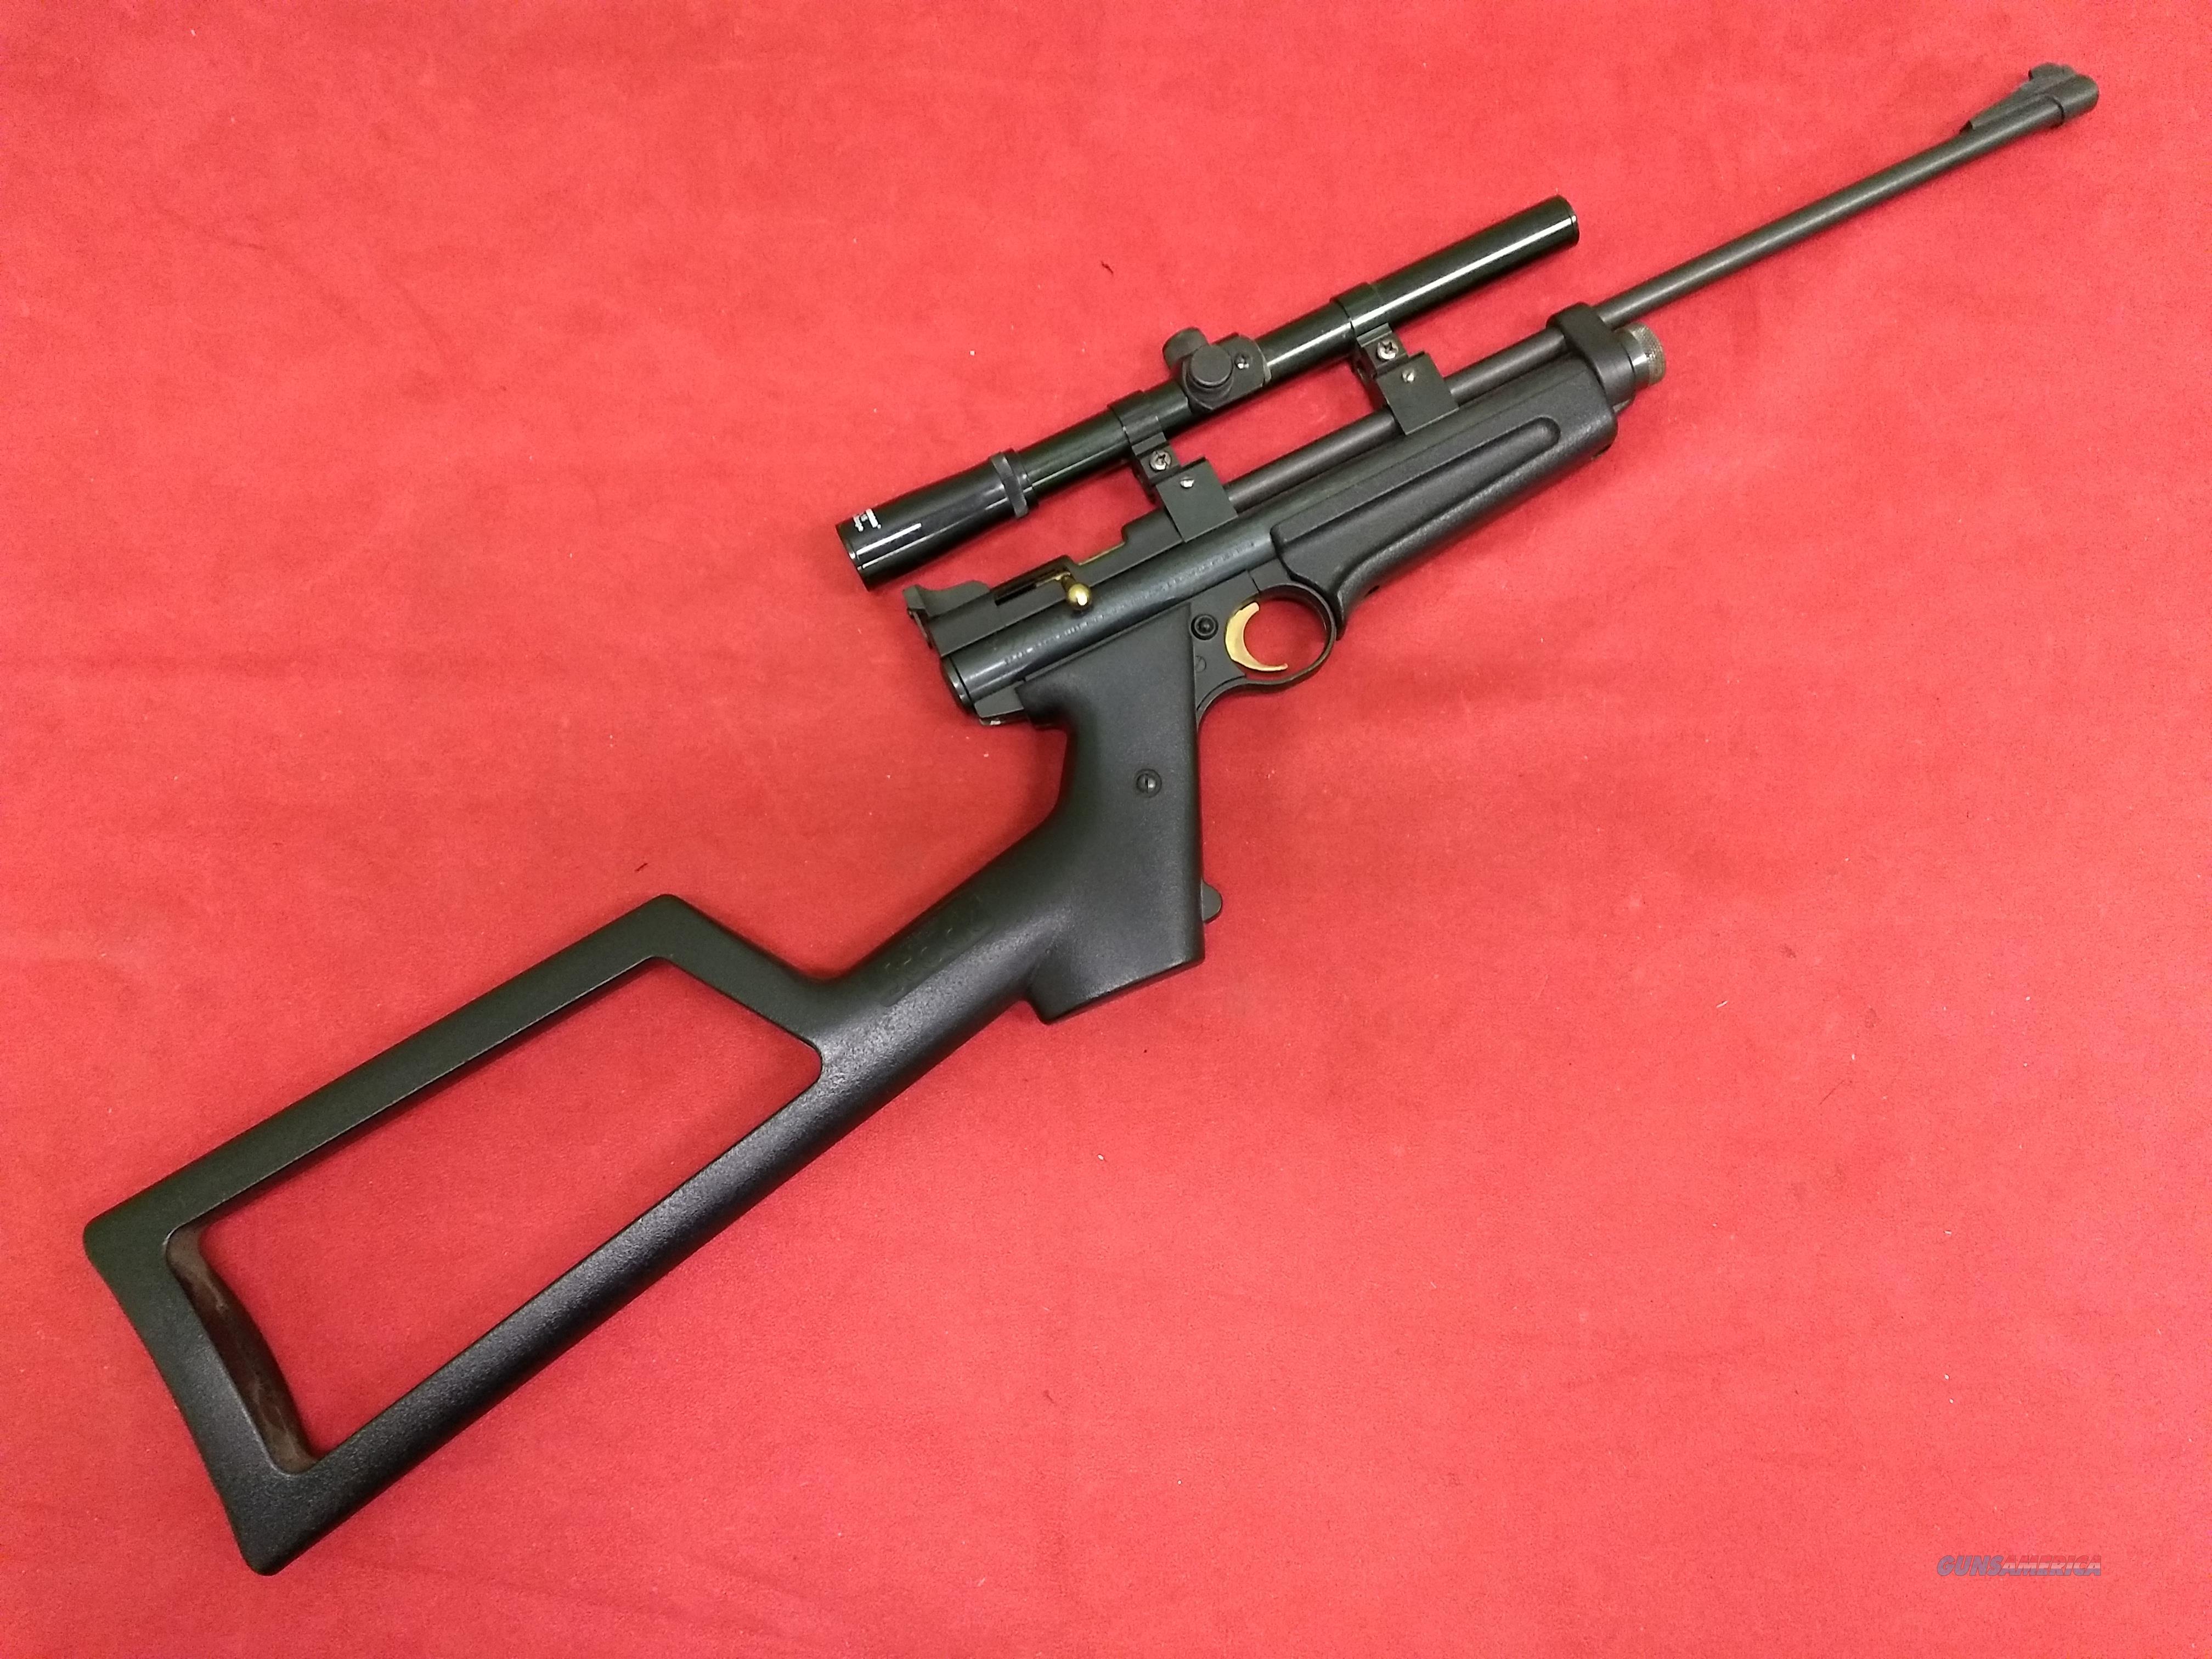 Crosman 2250B, .22 Cal, CO2 Powered, w/ Scope!  Non-Guns > Air Rifles - Pistols > CO2 Pistol